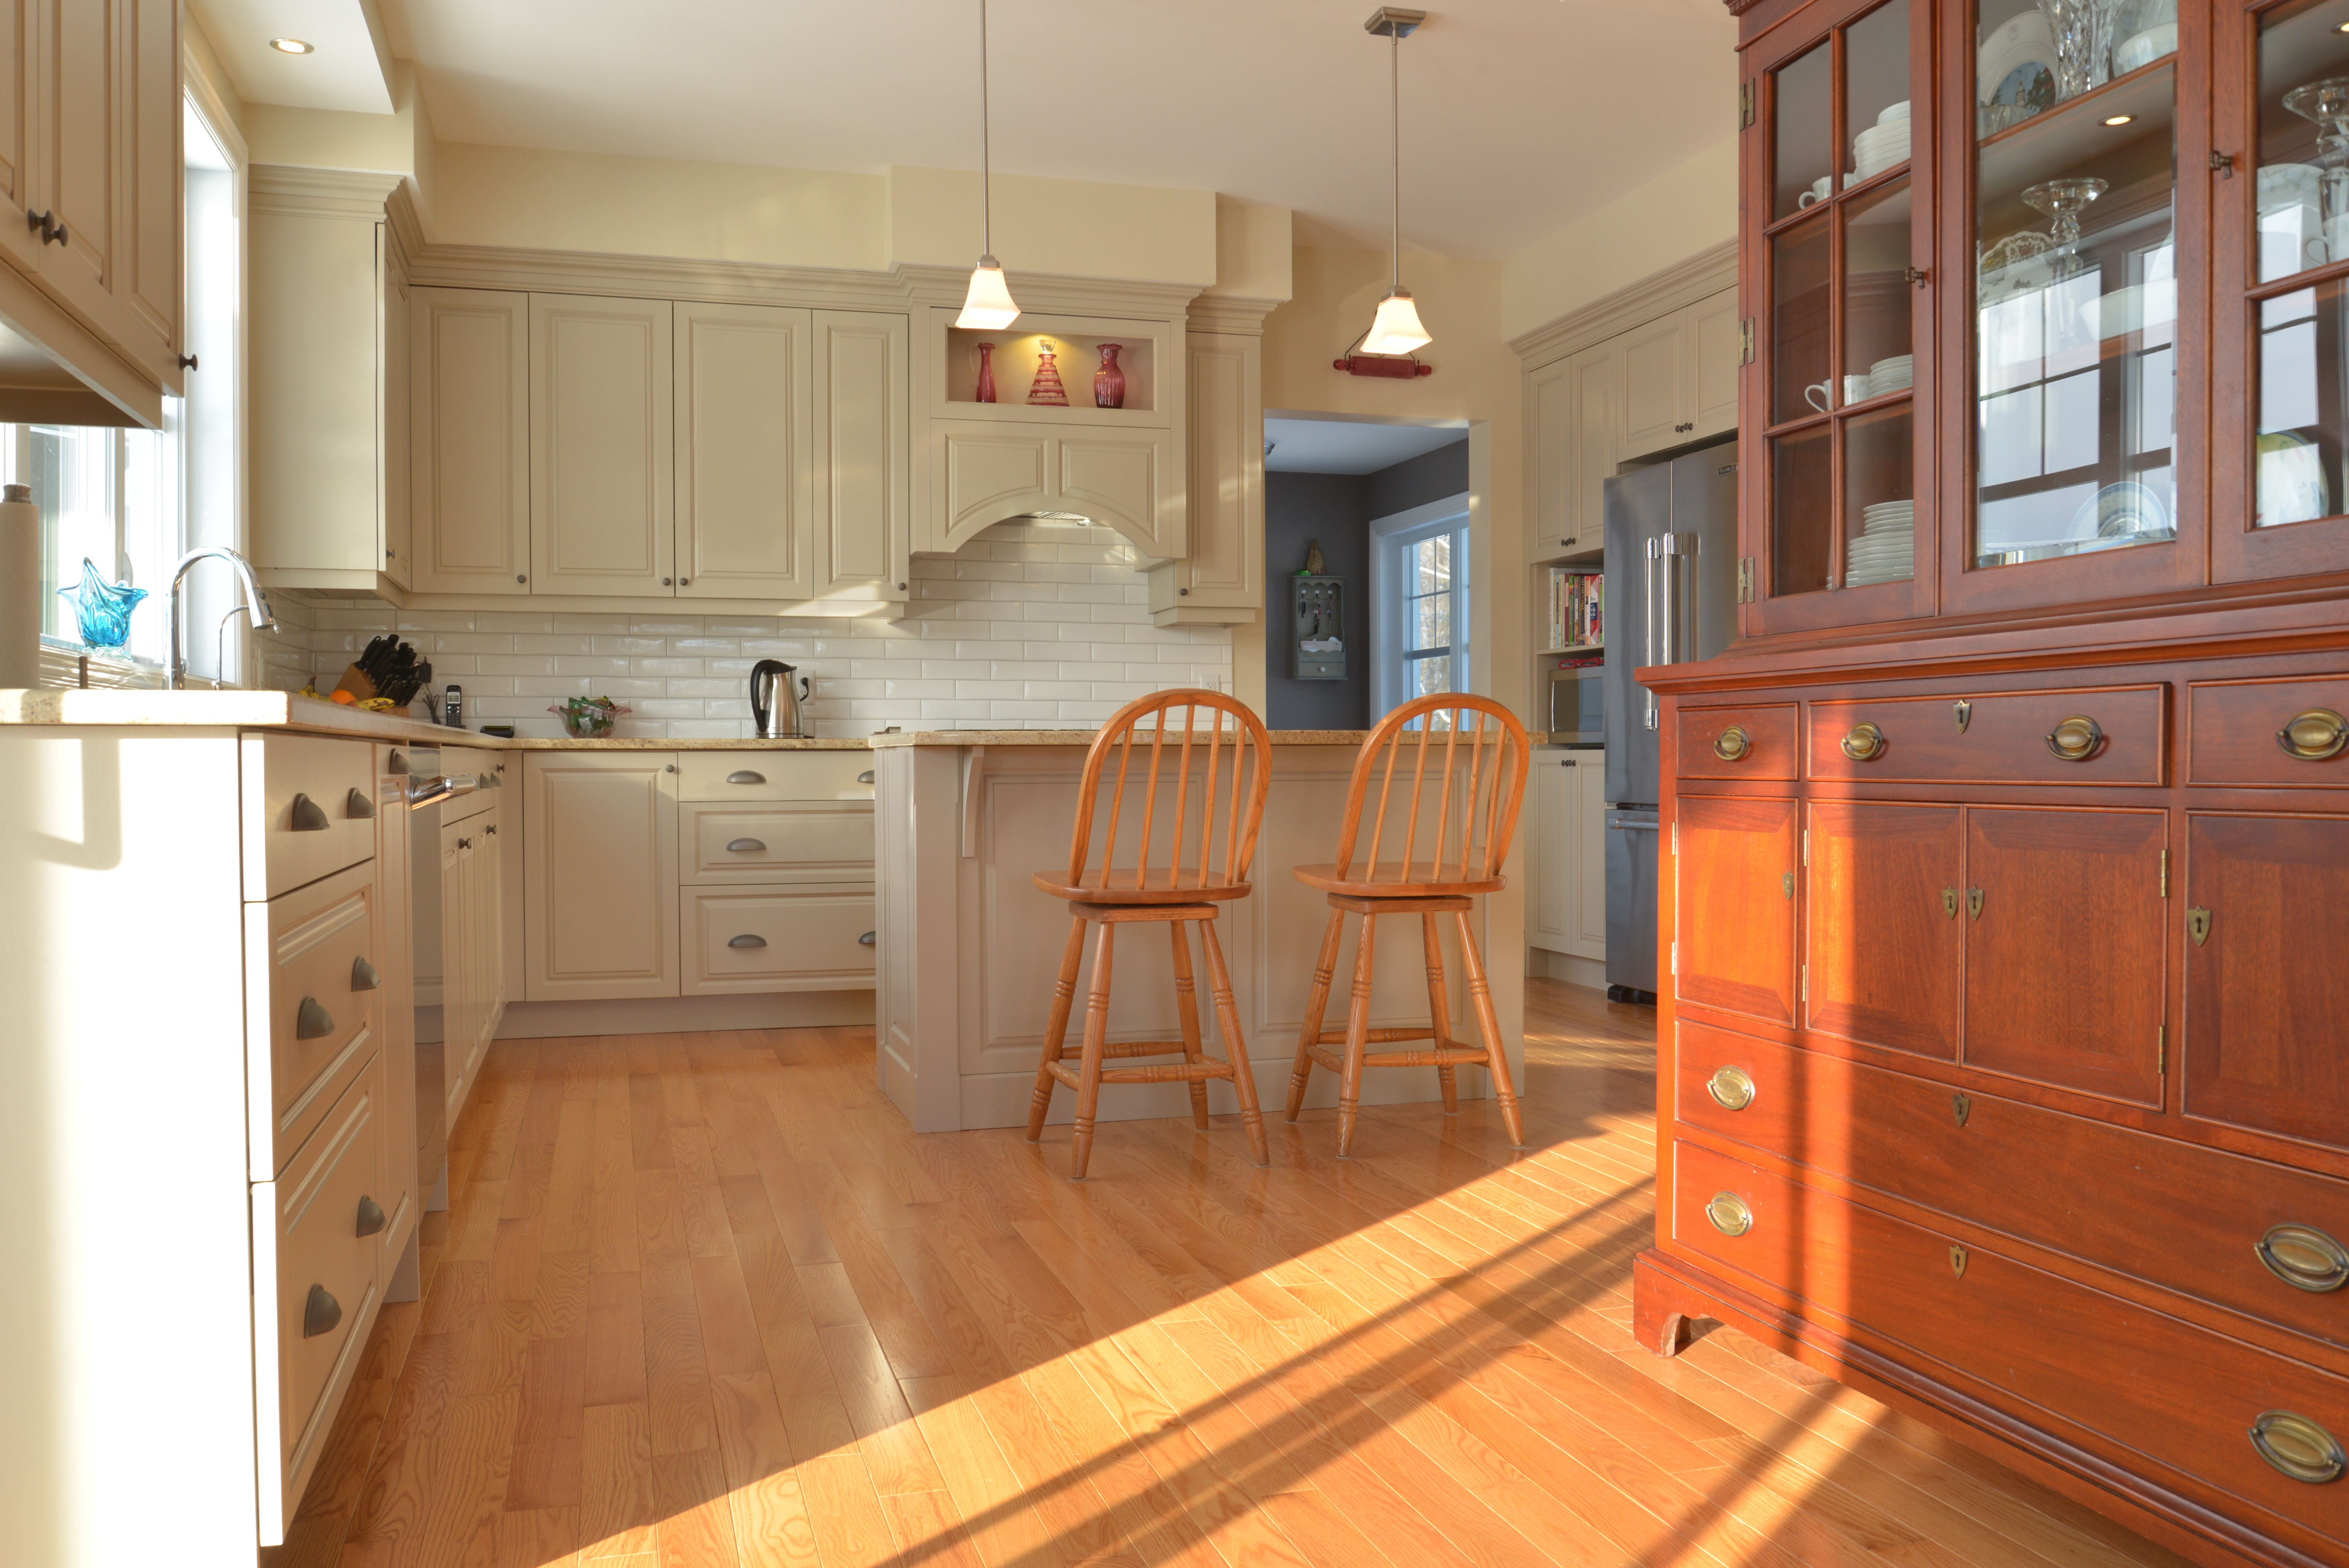 Red Oak Natural   Red oak, Home decor, Kitchen cabinets